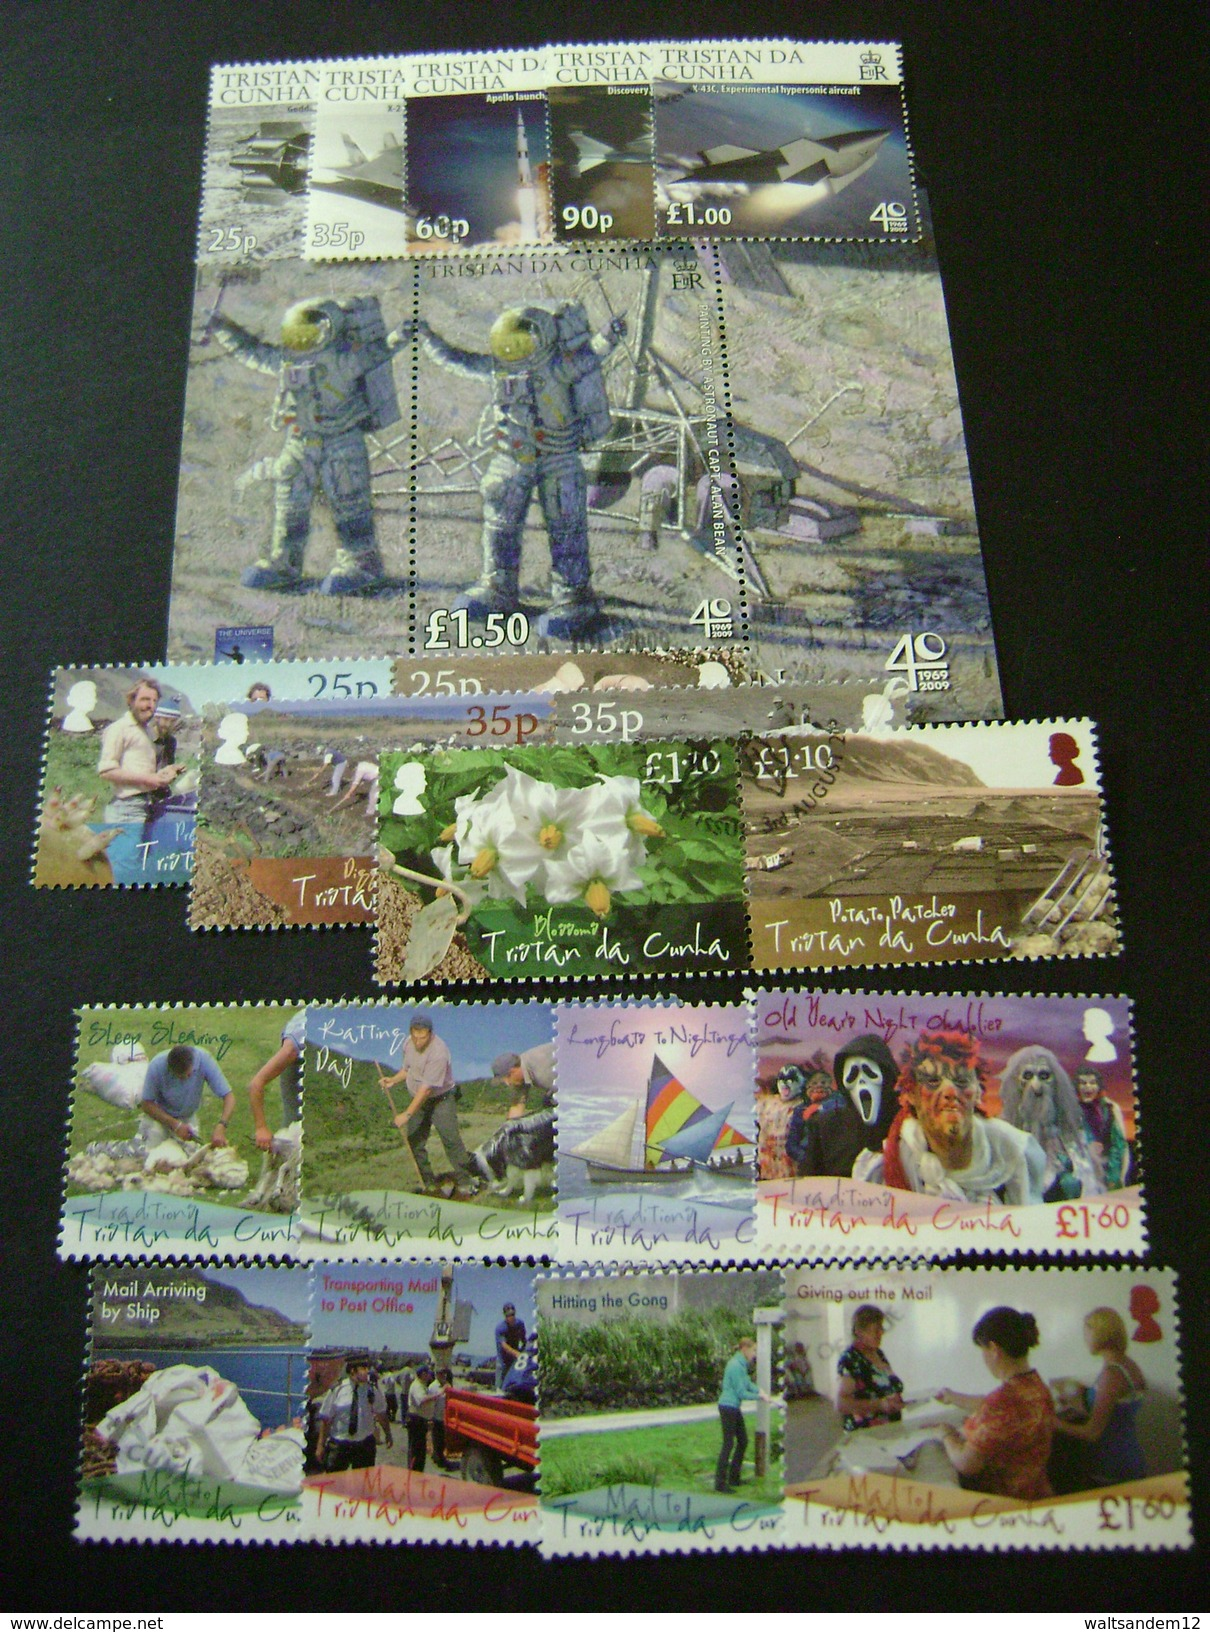 Tristan Da Cunha 2009 Commemorative Issues - Used - Tristan Da Cunha